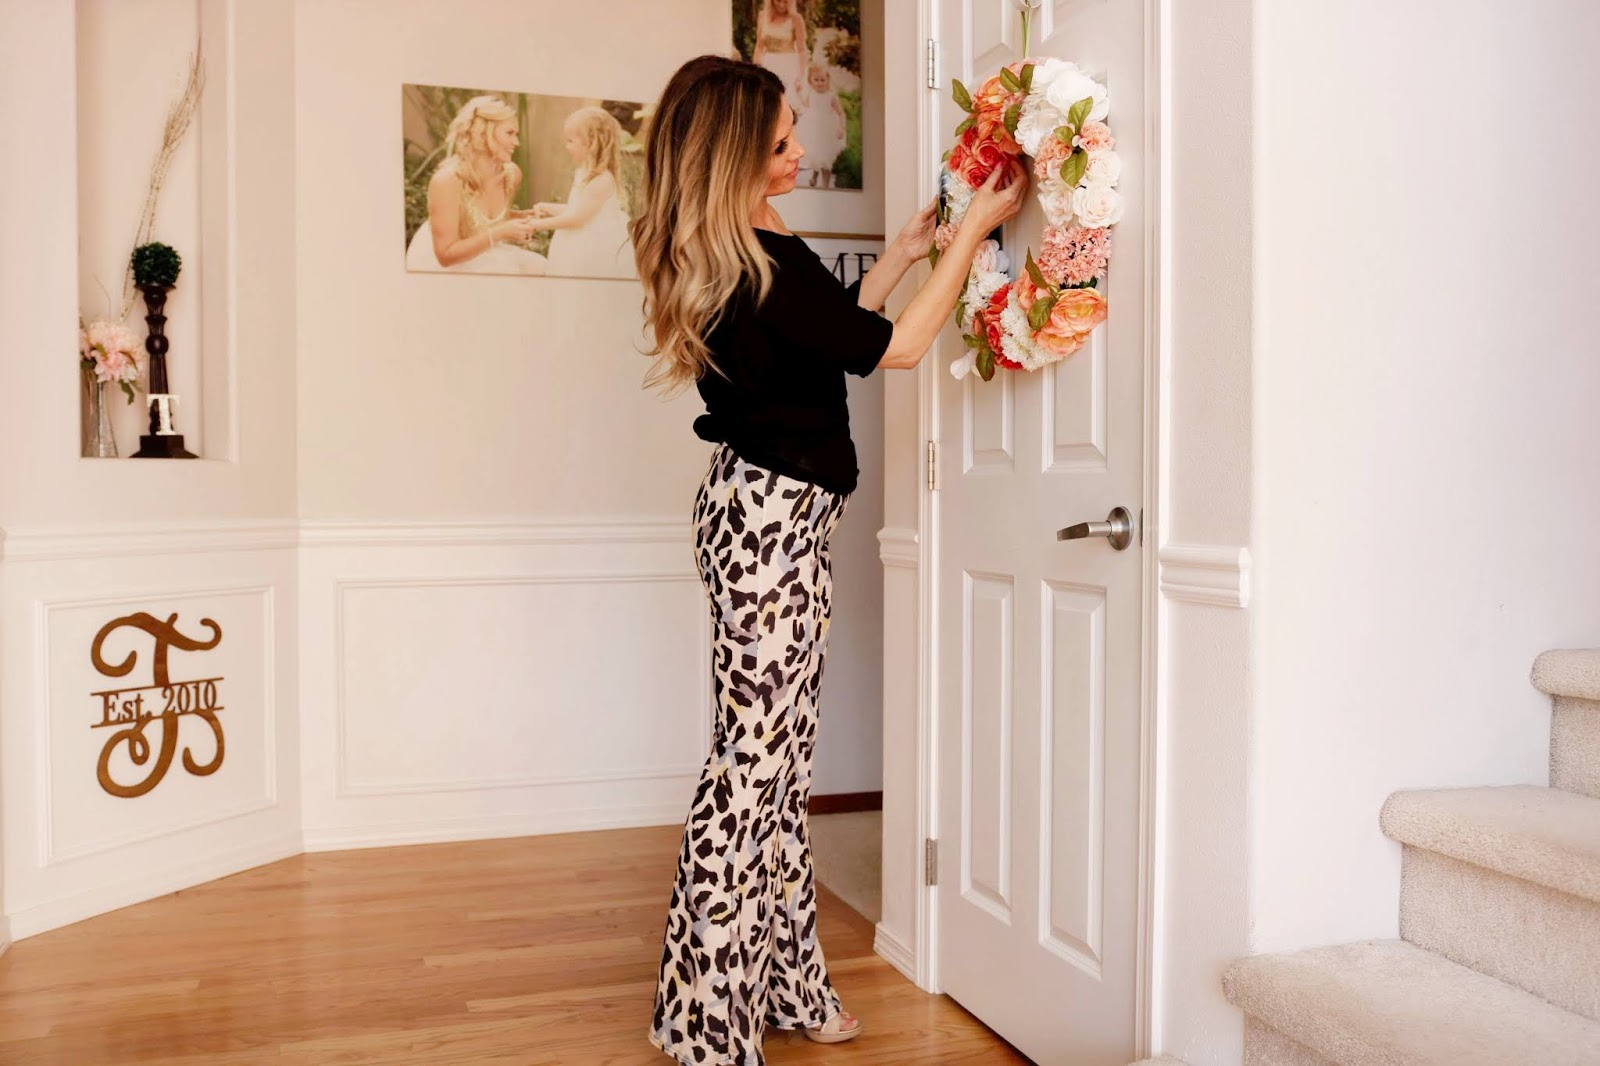 fall decor home modern house housewife peach entrance